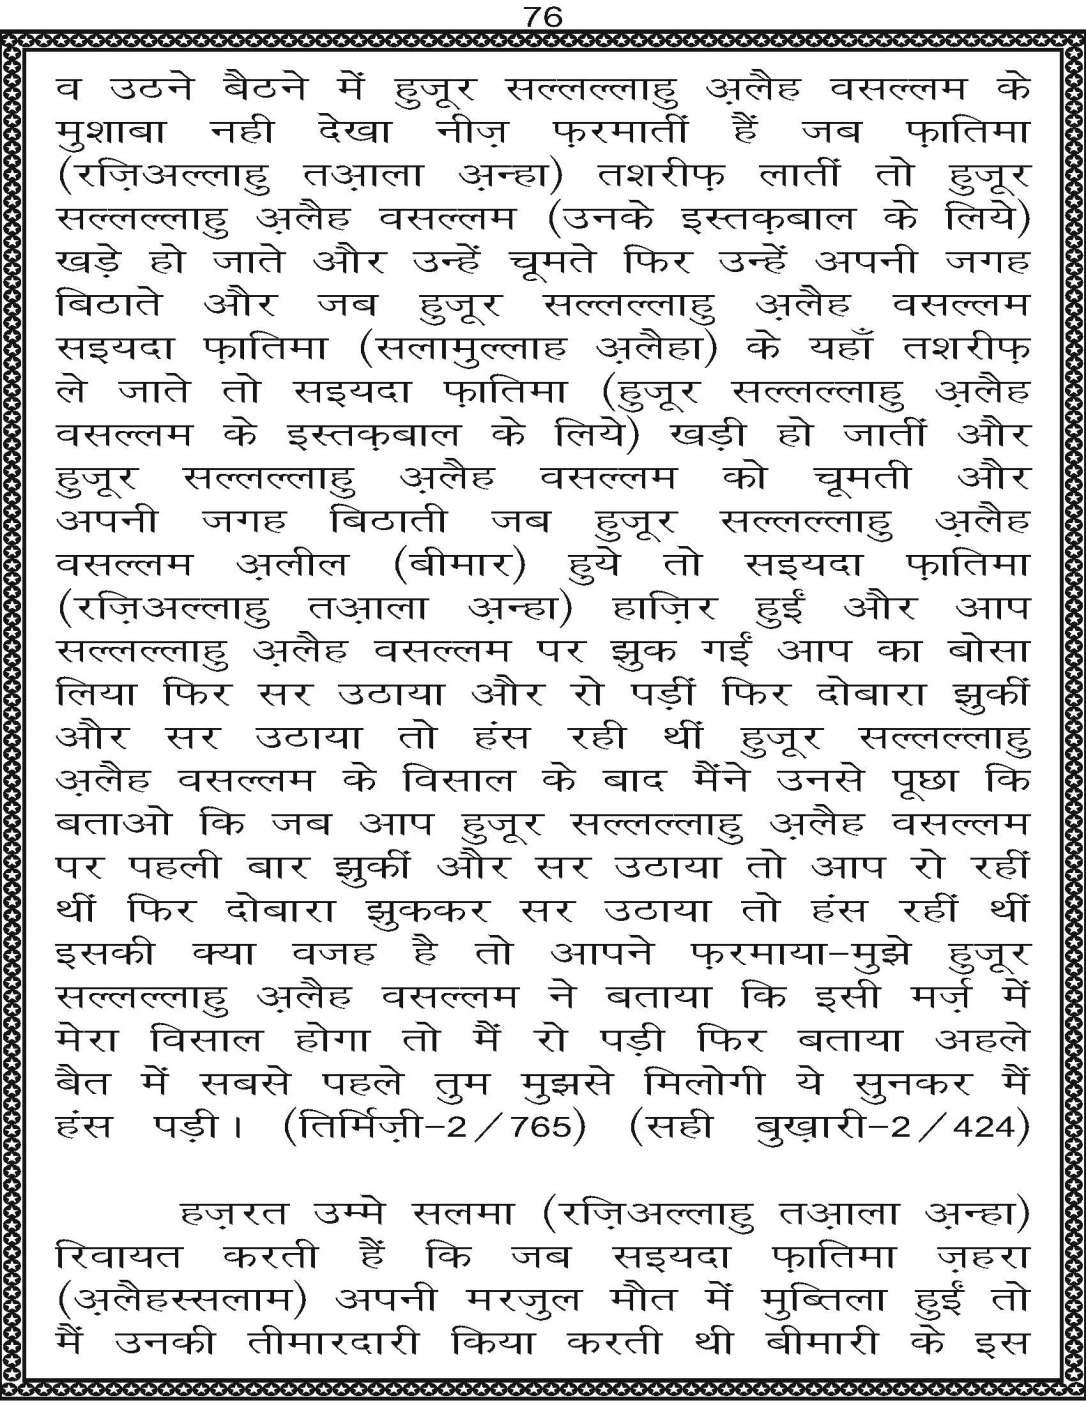 AzmateTaziyadari_Page_076